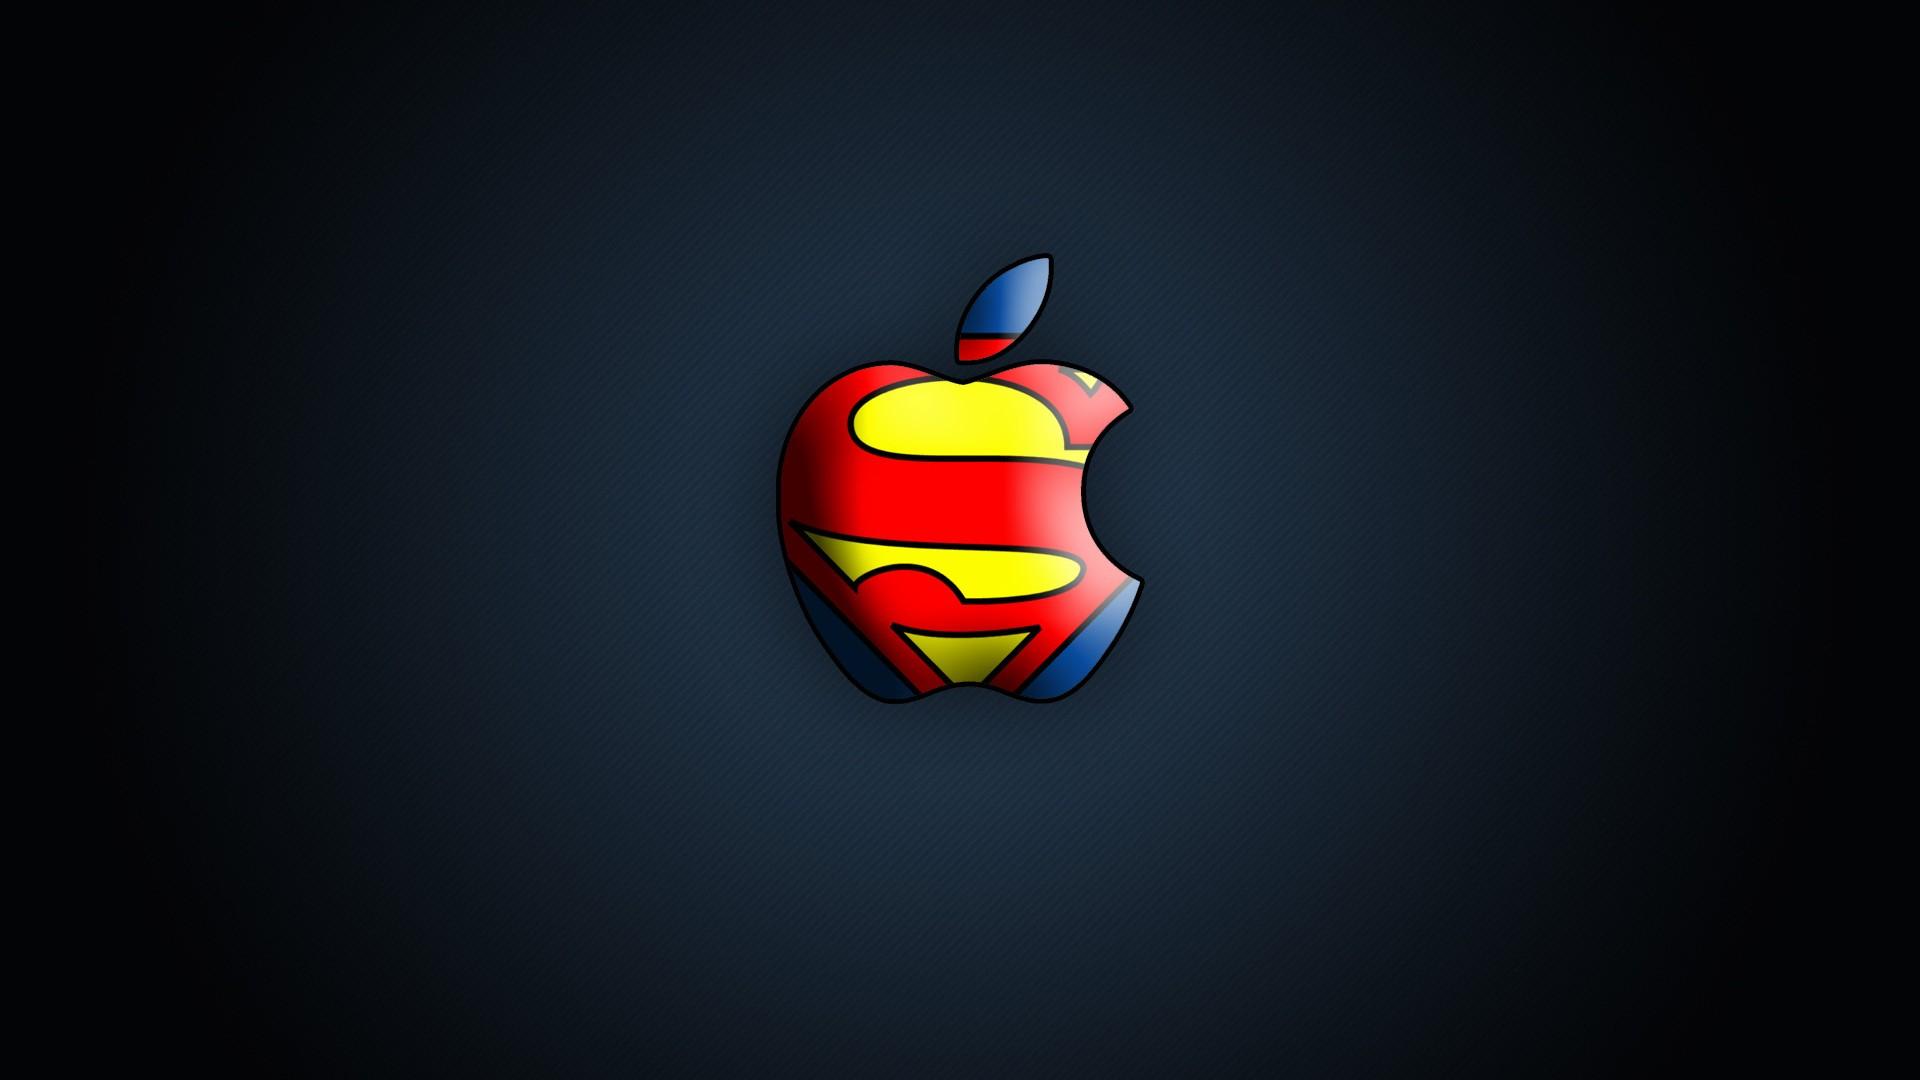 Superman Apple Logo Wallpaper 366 1920x1080 1080p Wallpaper Hd